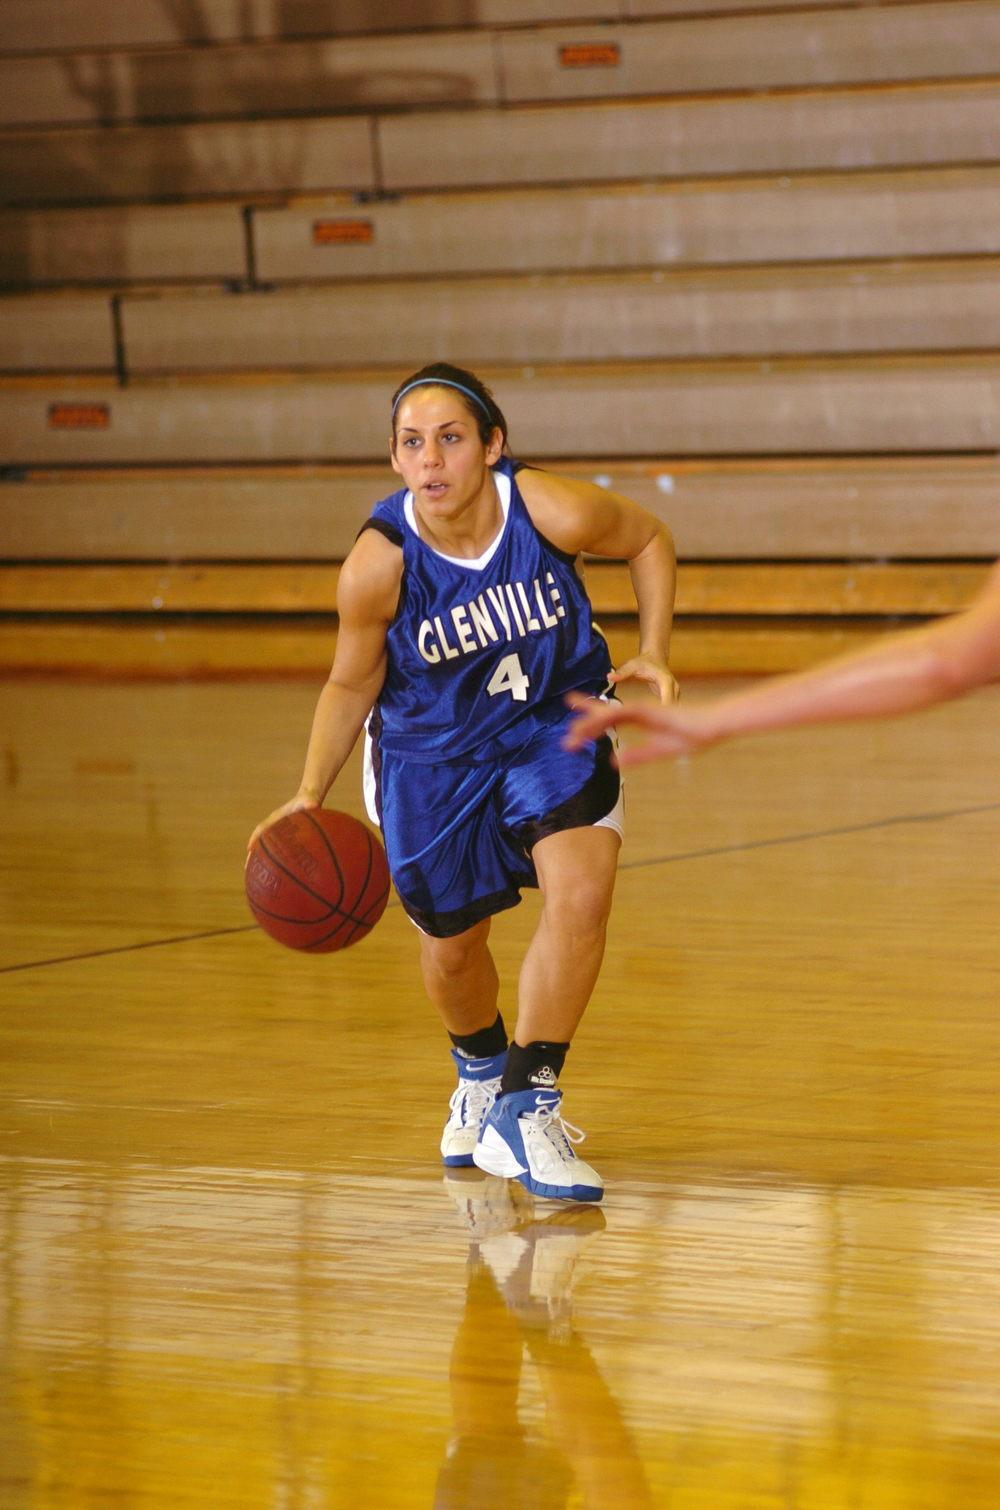 photo credit - Glenville State Athletics